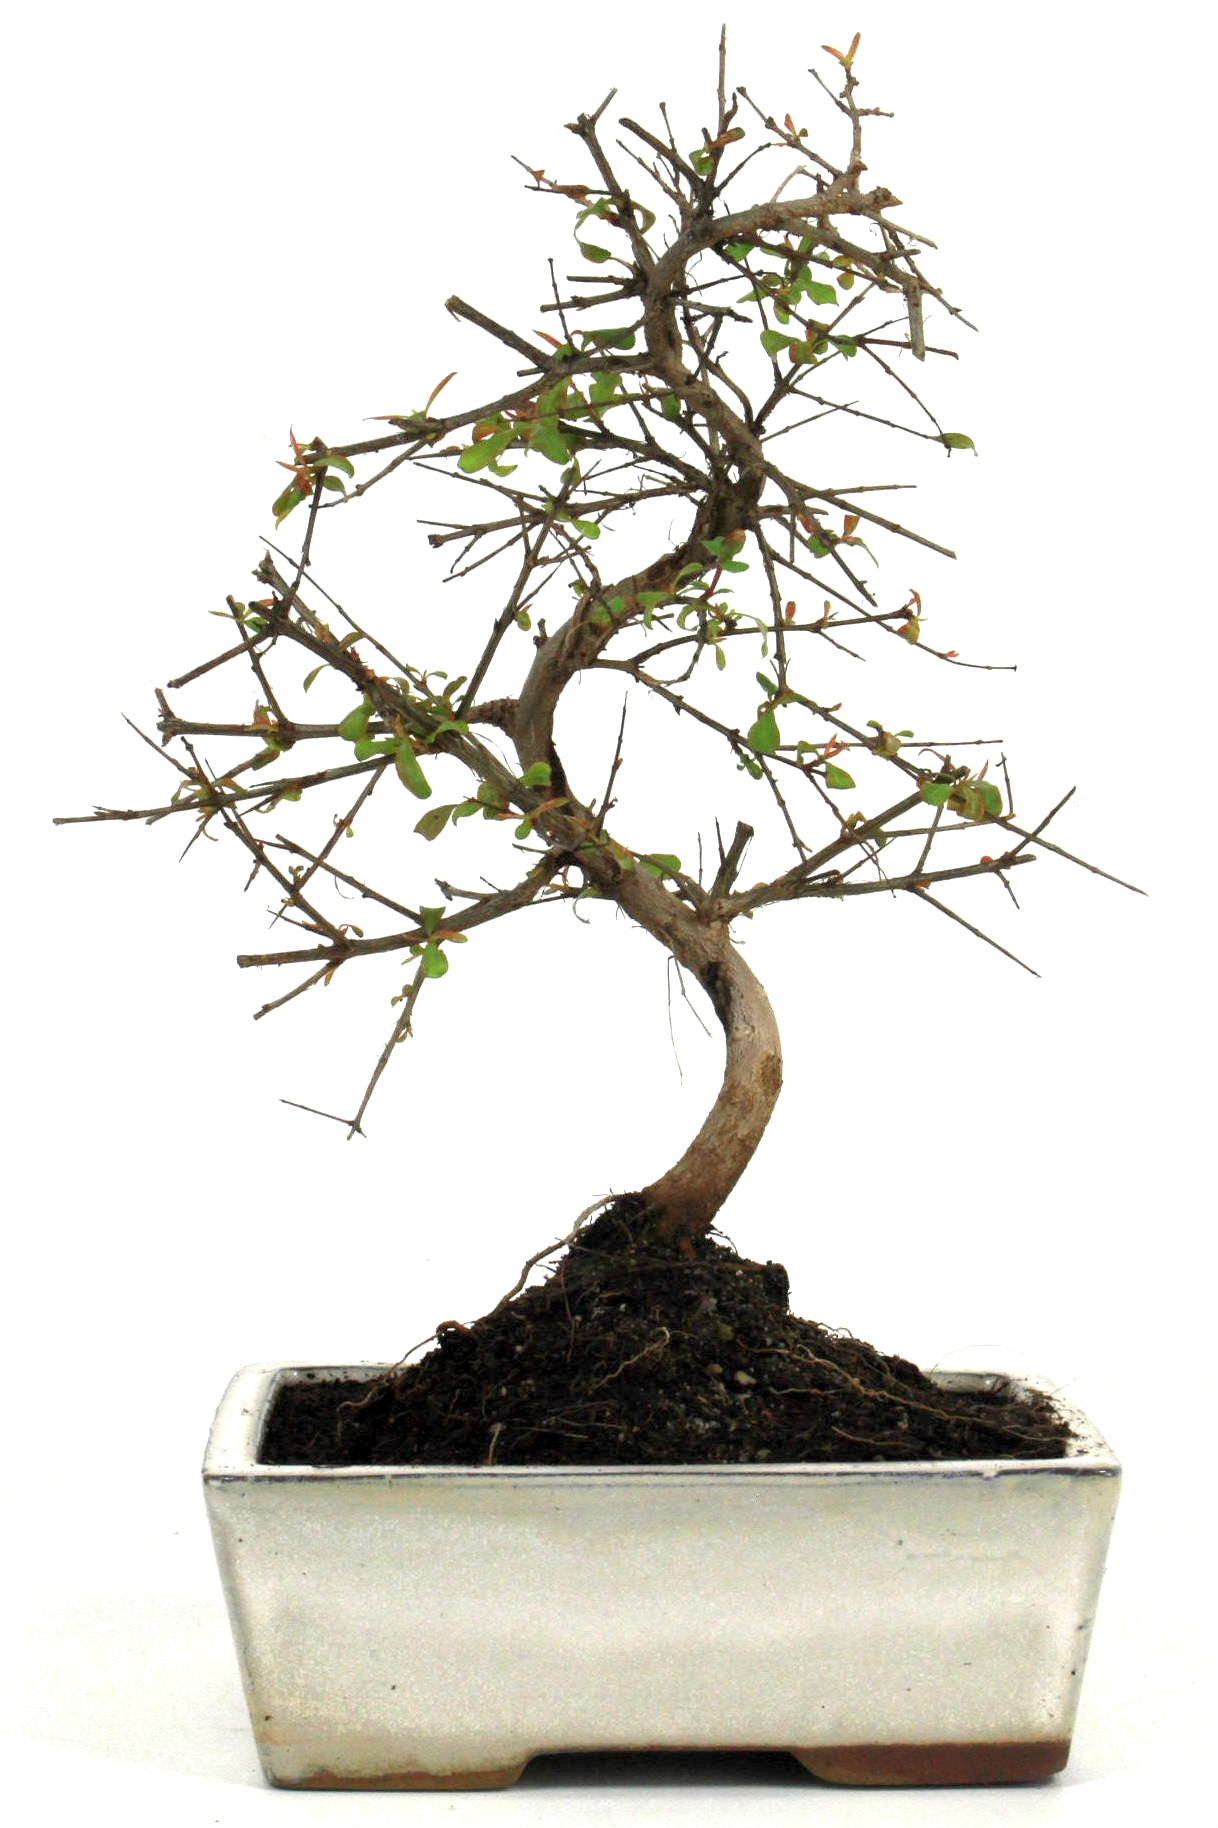 granatapfel bonsai 25 30 cm 1613 bei oyaki bonsai kaufen. Black Bedroom Furniture Sets. Home Design Ideas